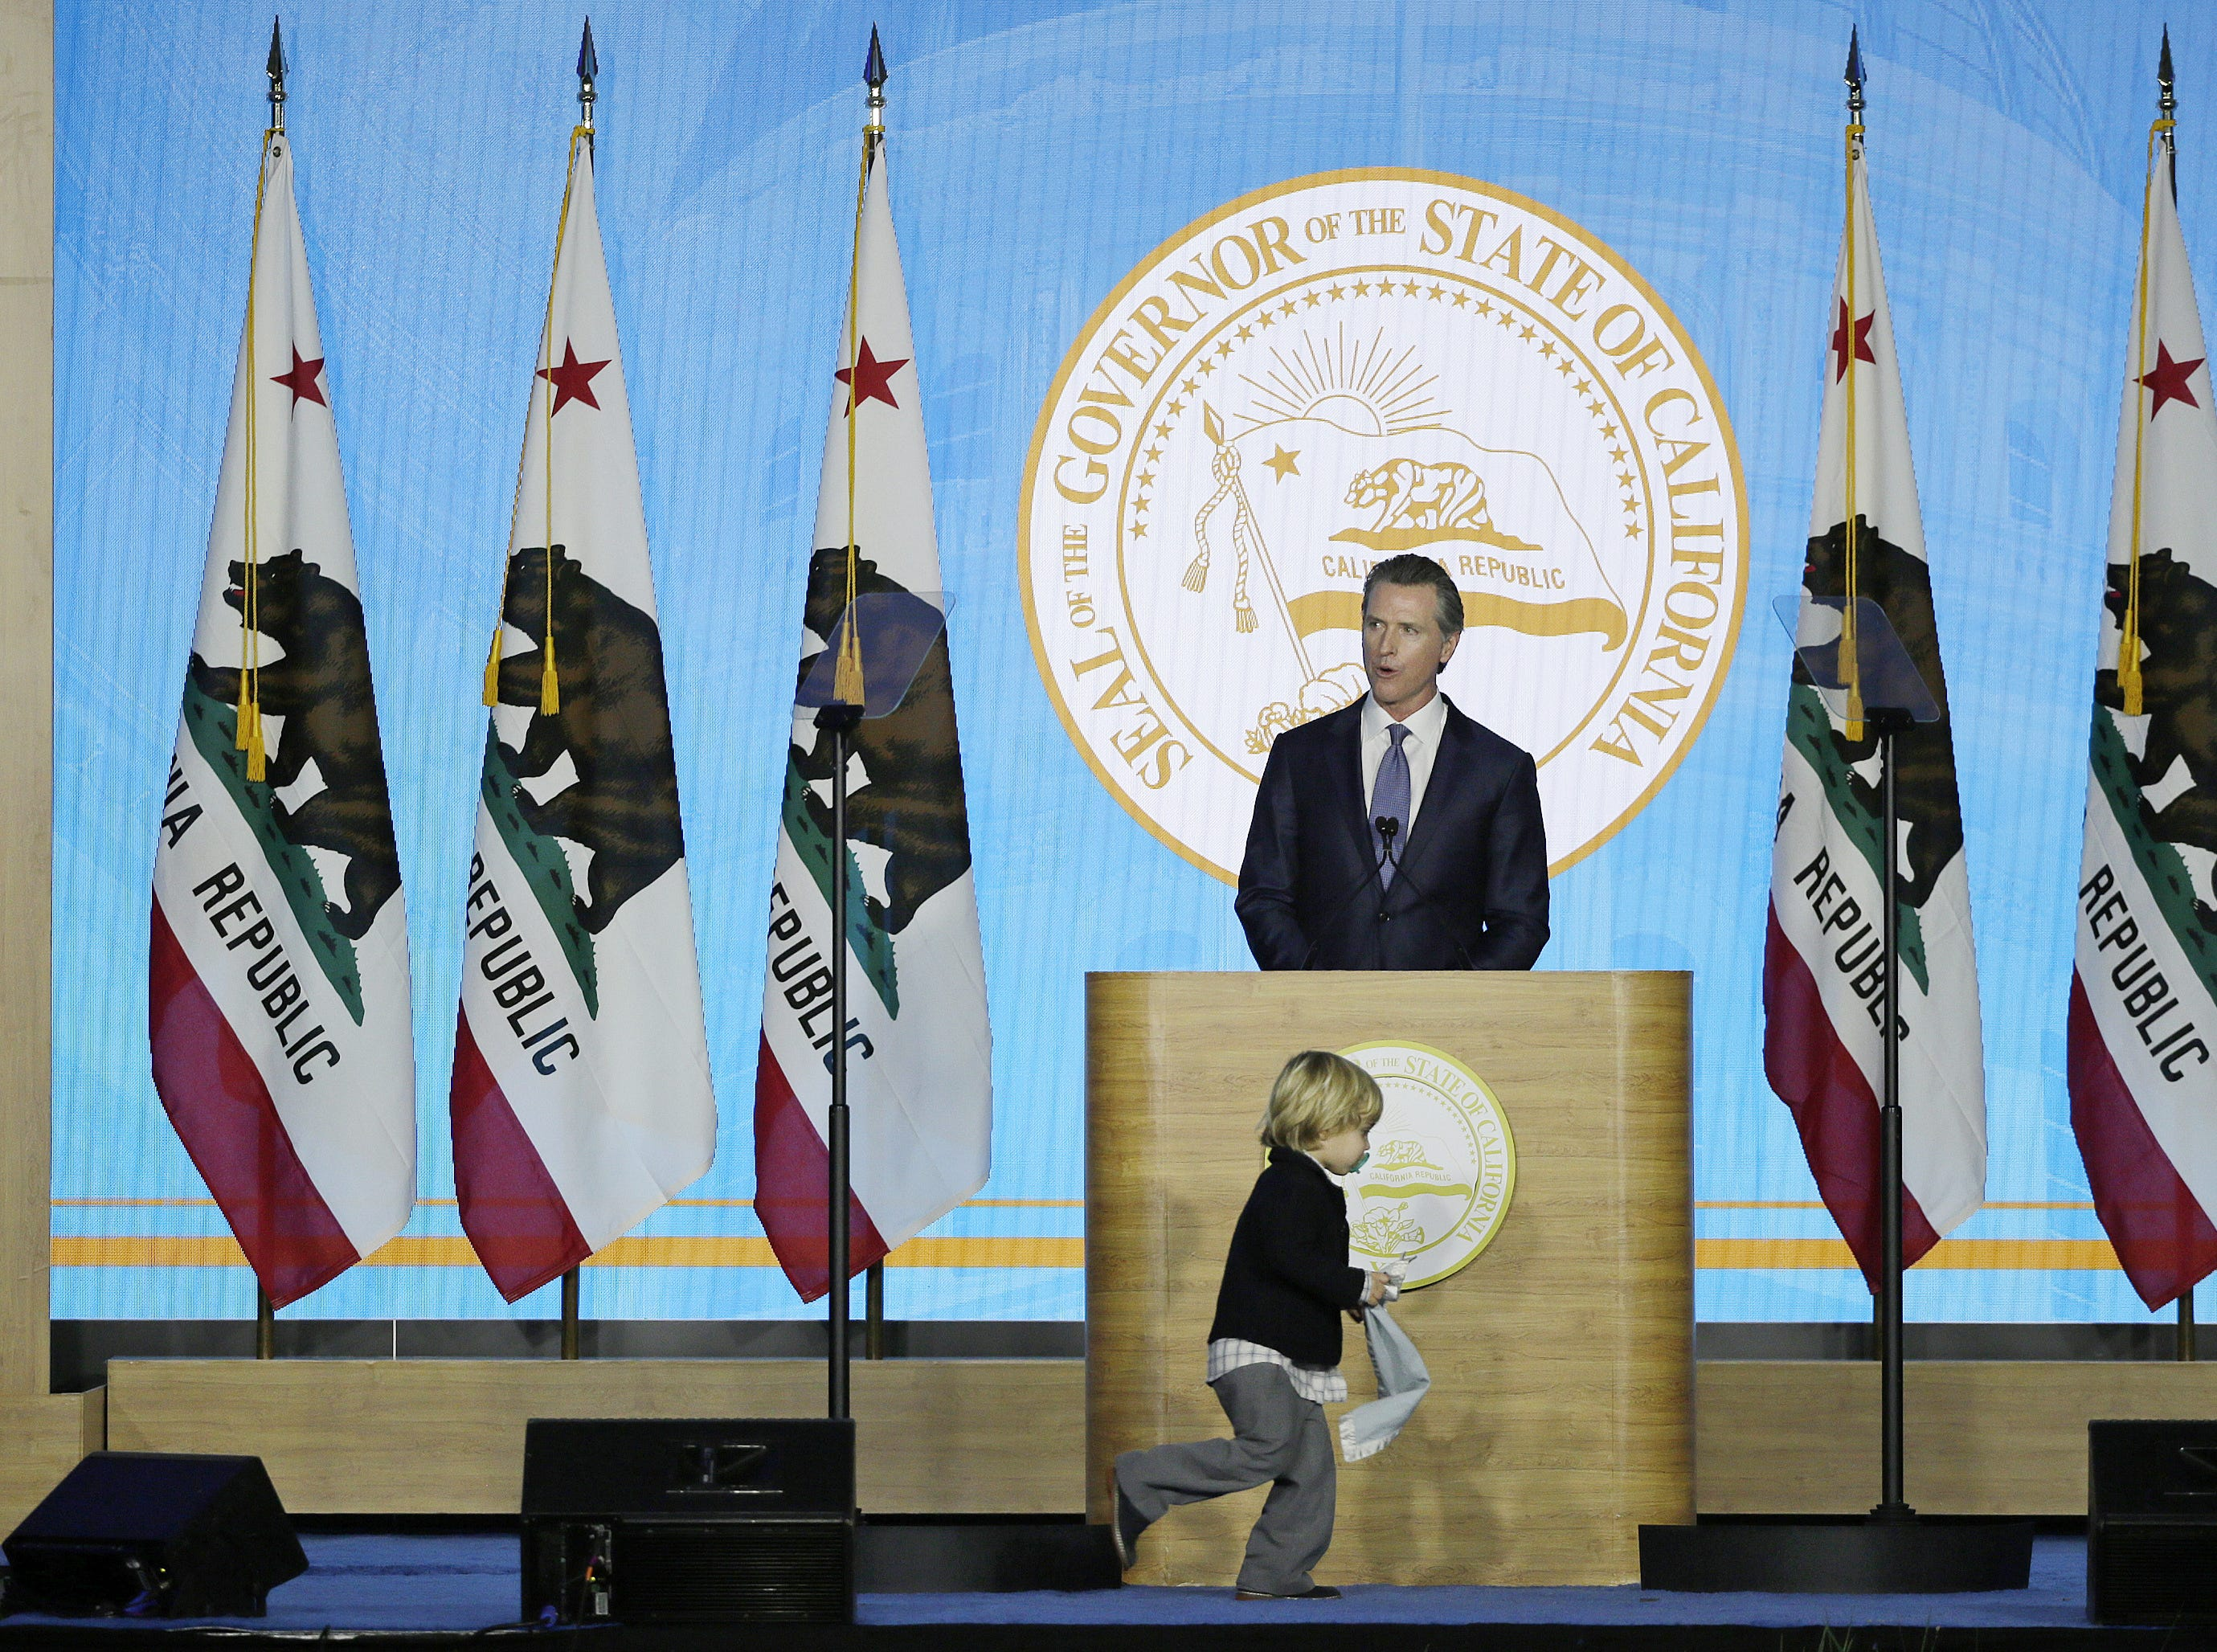 Gov. Gavin Newsom speaks during his inauguration as his son Dutch runs around the podium on Monday, Jan. 7, 2019, in Sacramento.